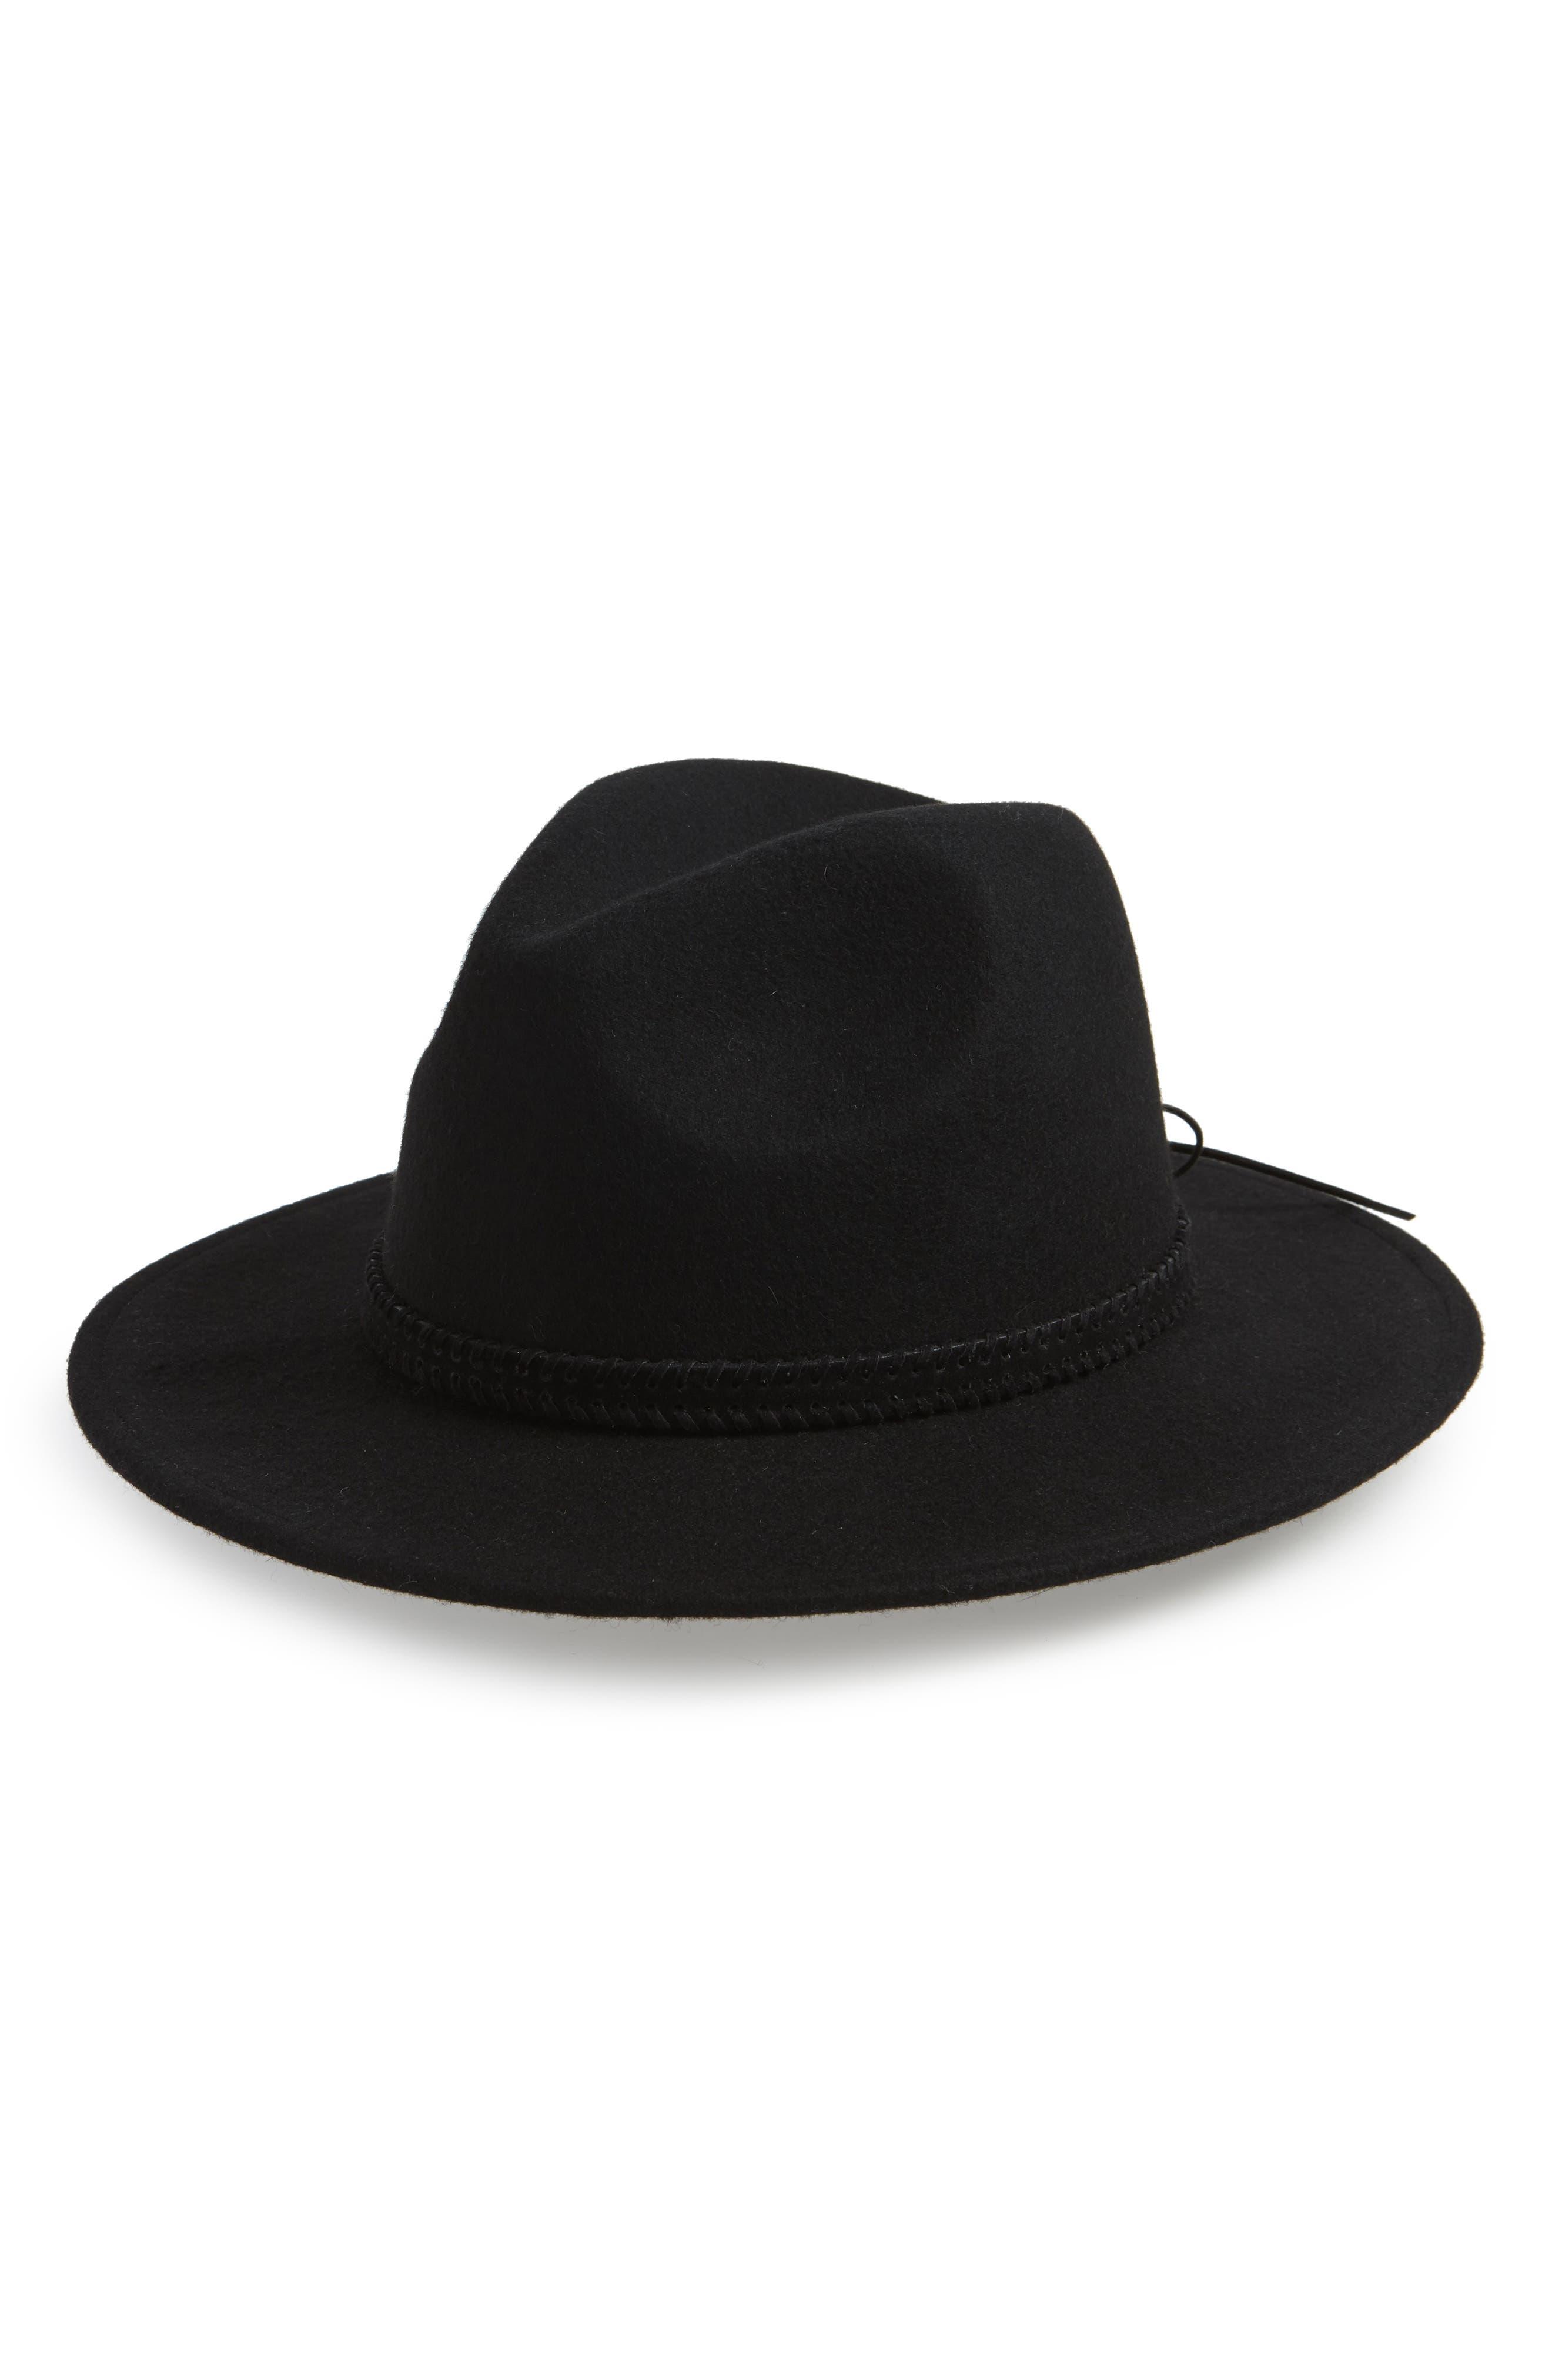 TREASURE & BOND, Felt Panama Hat, Main thumbnail 1, color, 010